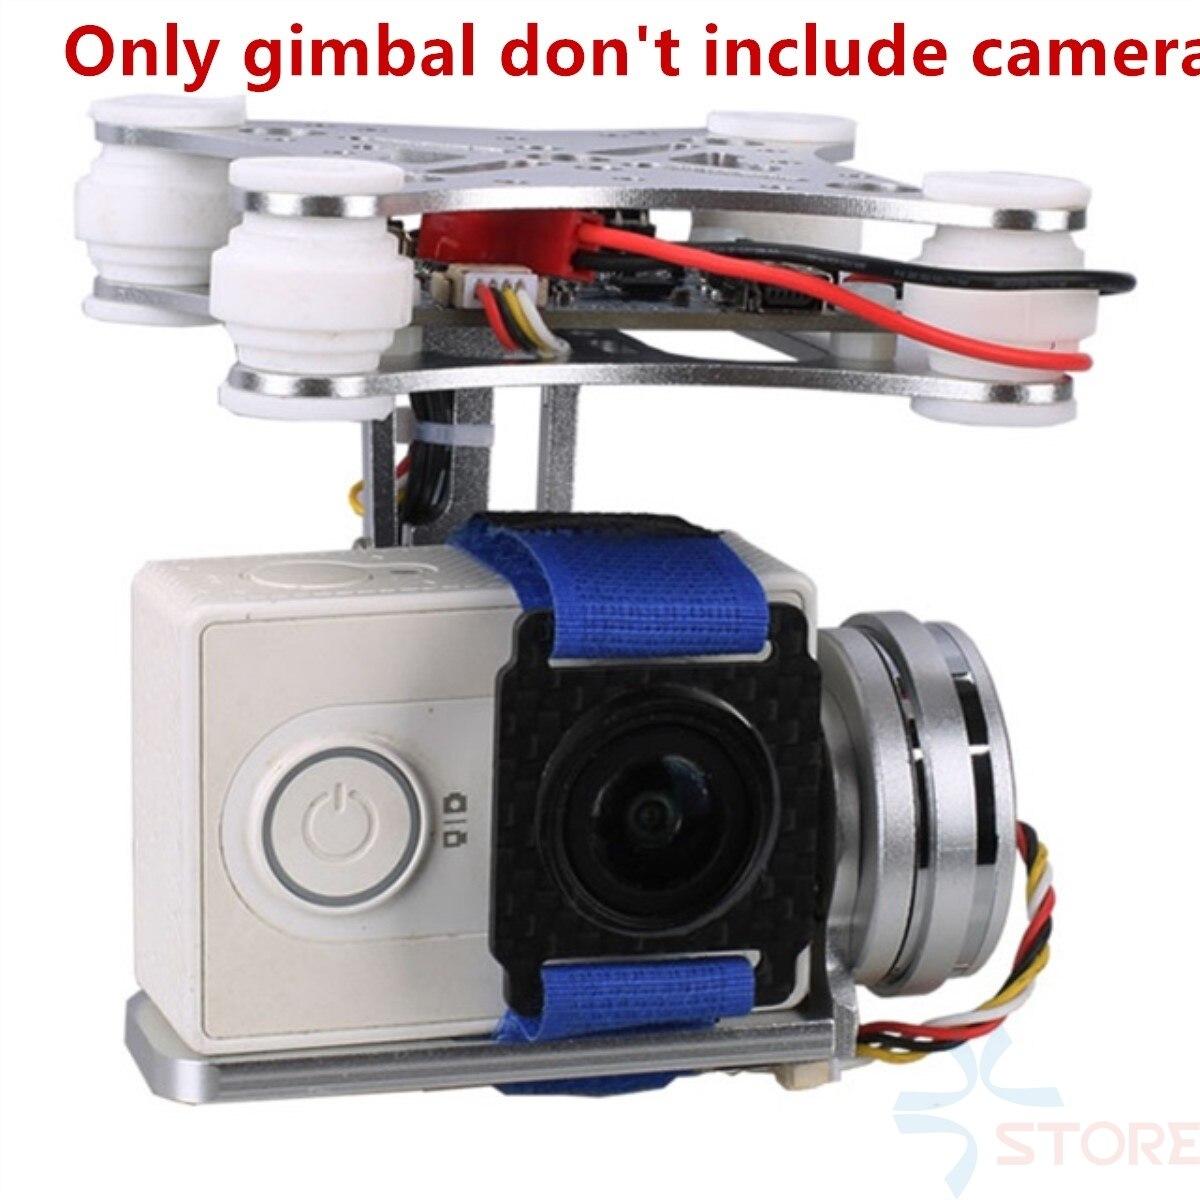 2 Aixs 2D Bürstenlose Kamera Gimbal für Gopro SJCAM XIAOMI YI Action Kamera Eken F450 F550 S500 FPV Drone Multirotor quadrocopter